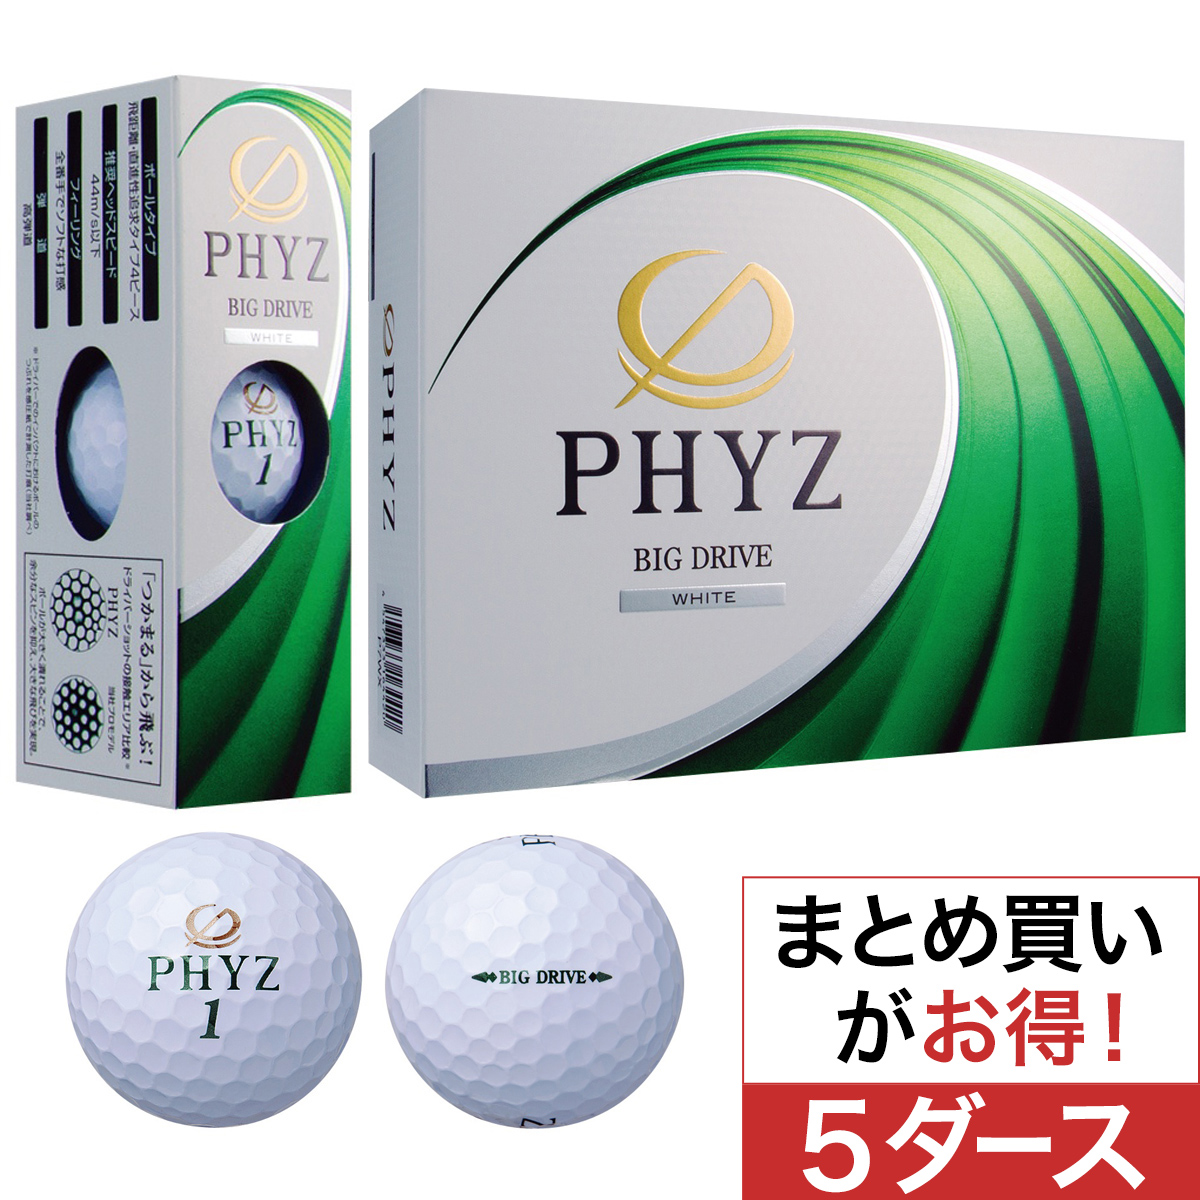 PHYZ ボール 2017年モデル 5ダースセット